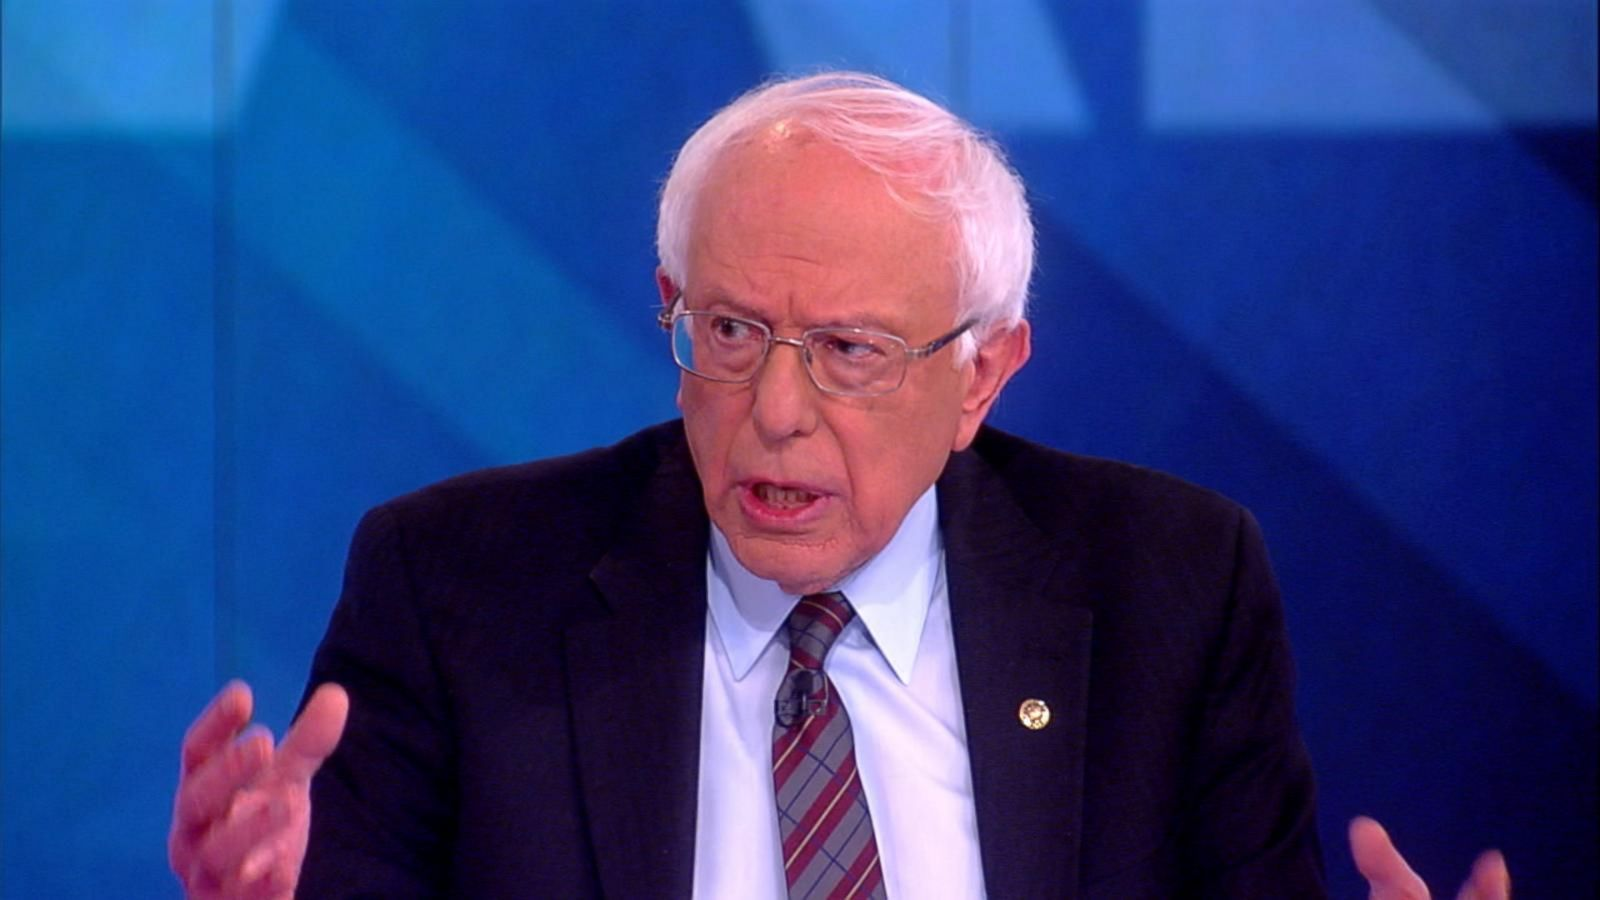 041535a5 Bernie Sanders mulling 2020 run: Trump must be 'defeated' - ABC News